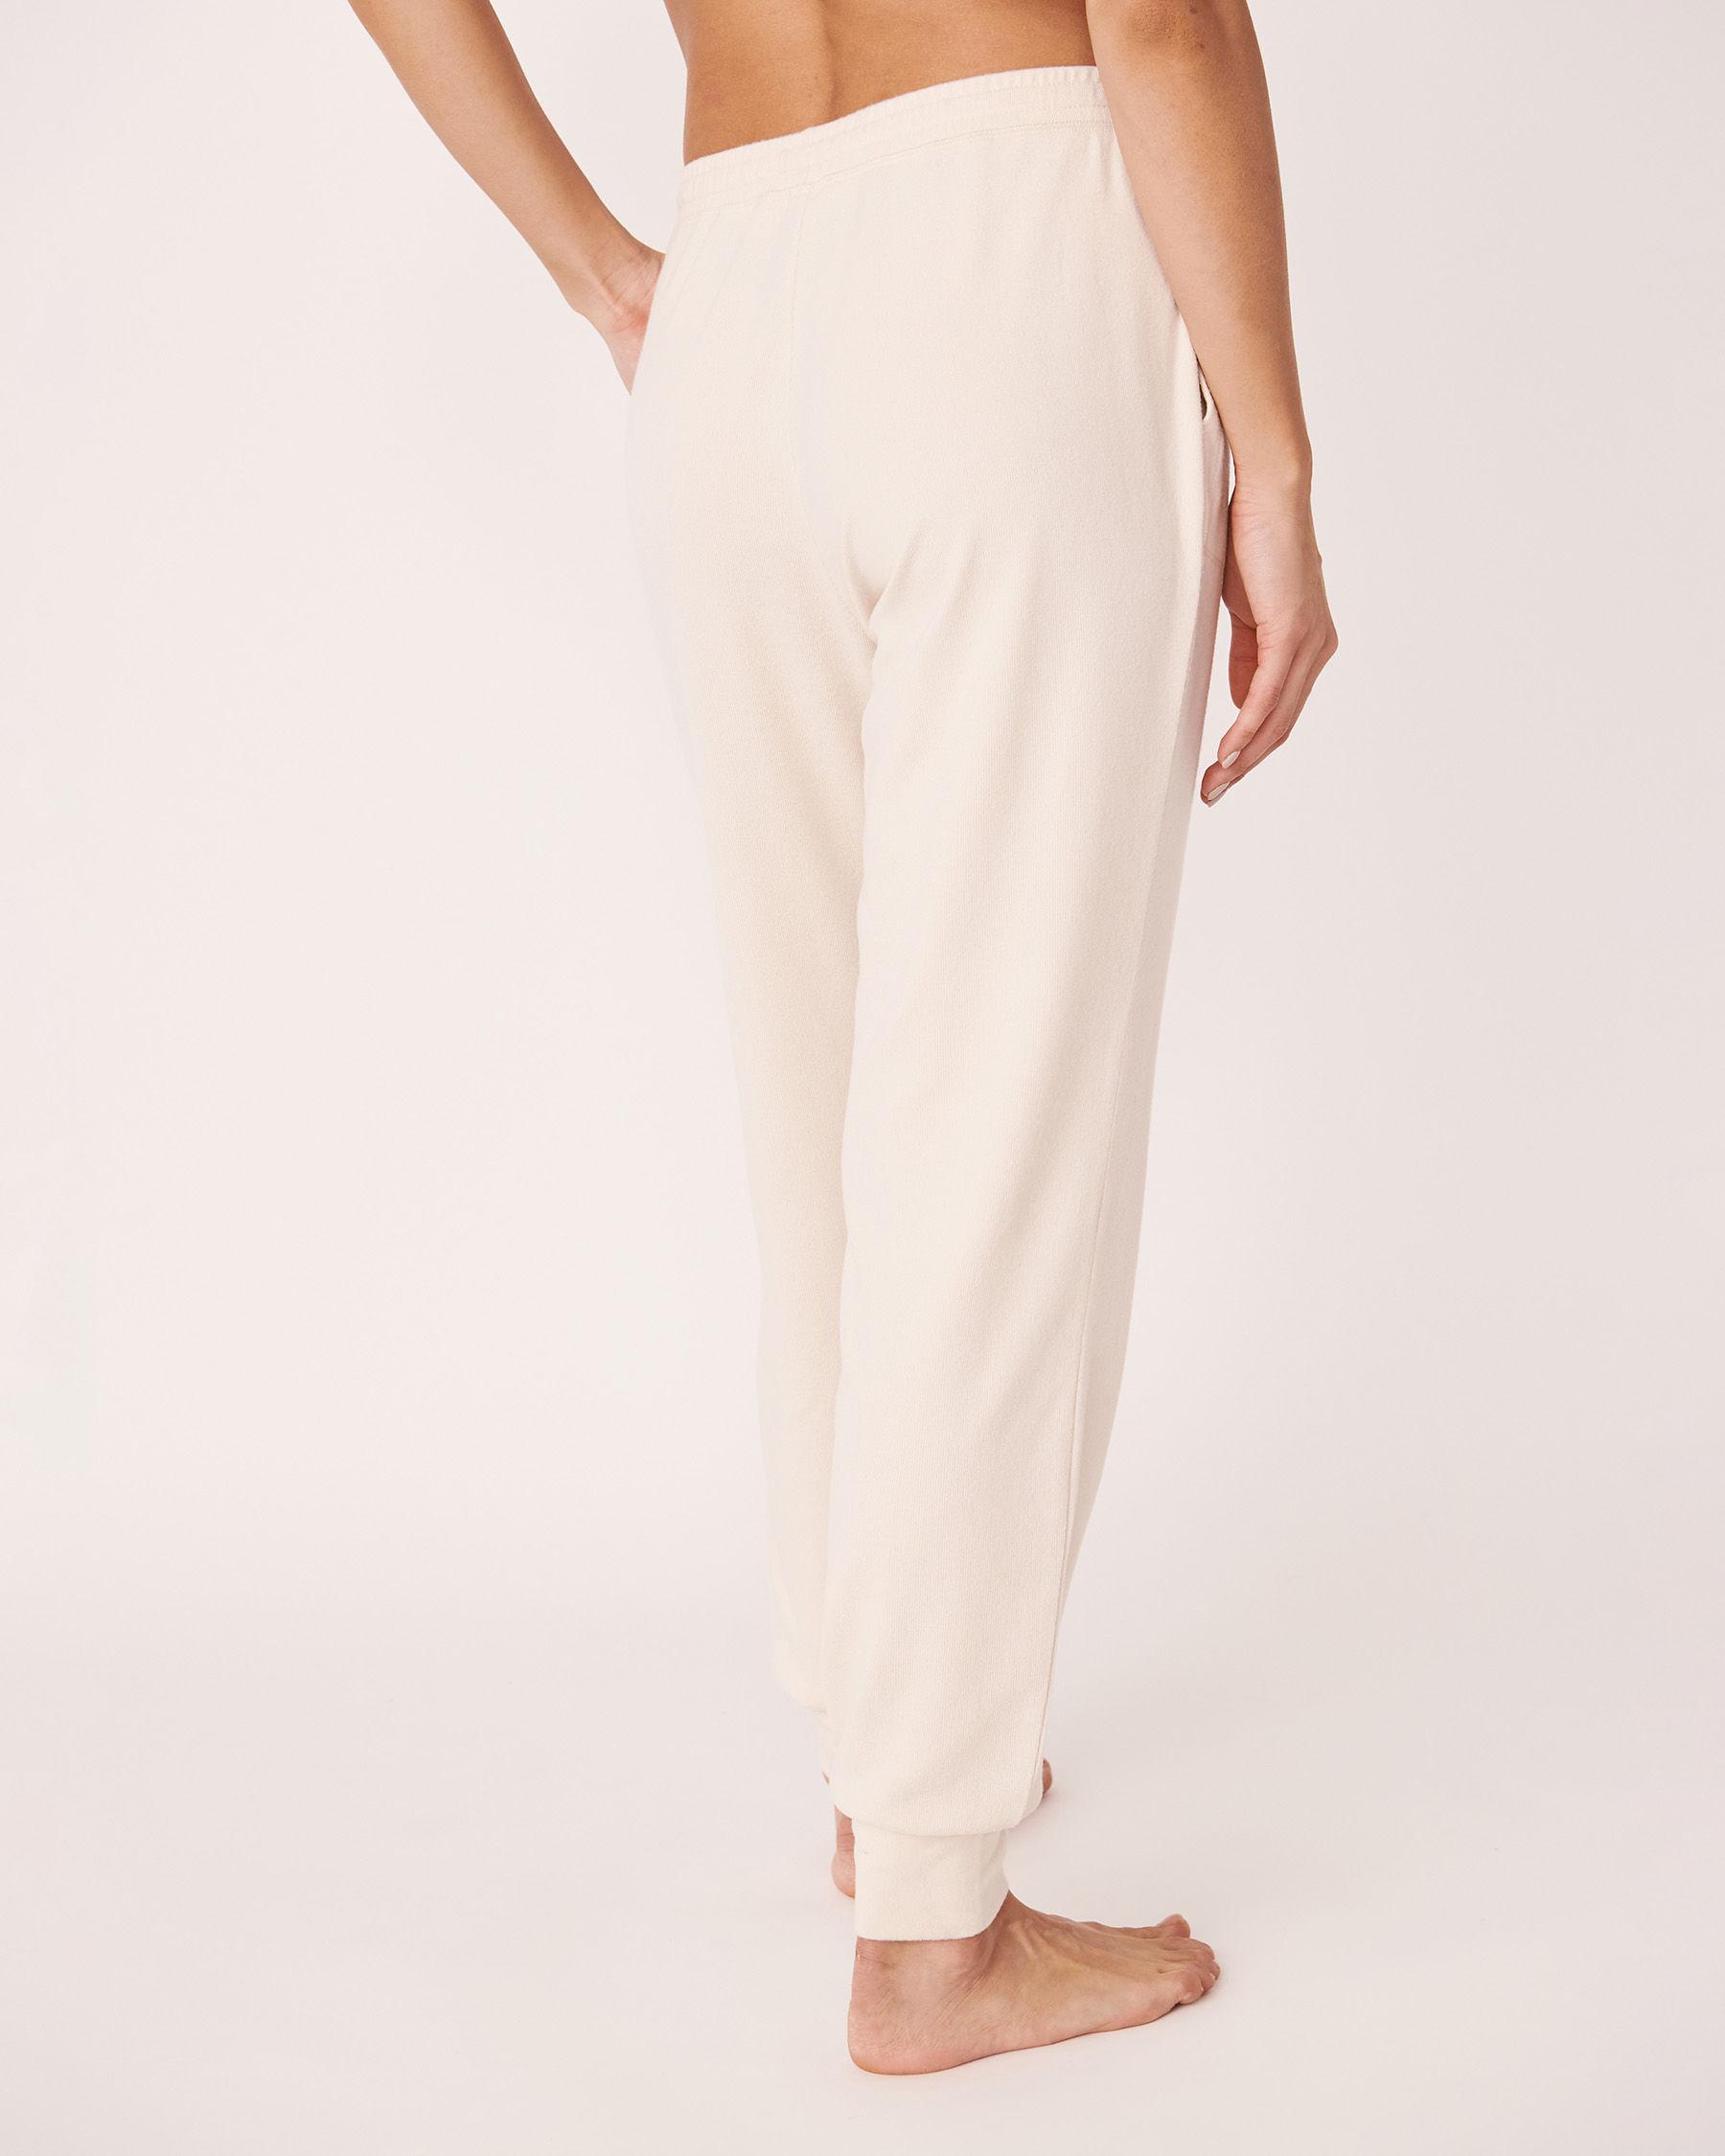 LA VIE EN ROSE Recycled Fibers Fitted Pyjama Pant Grey mix 40200129 - View2